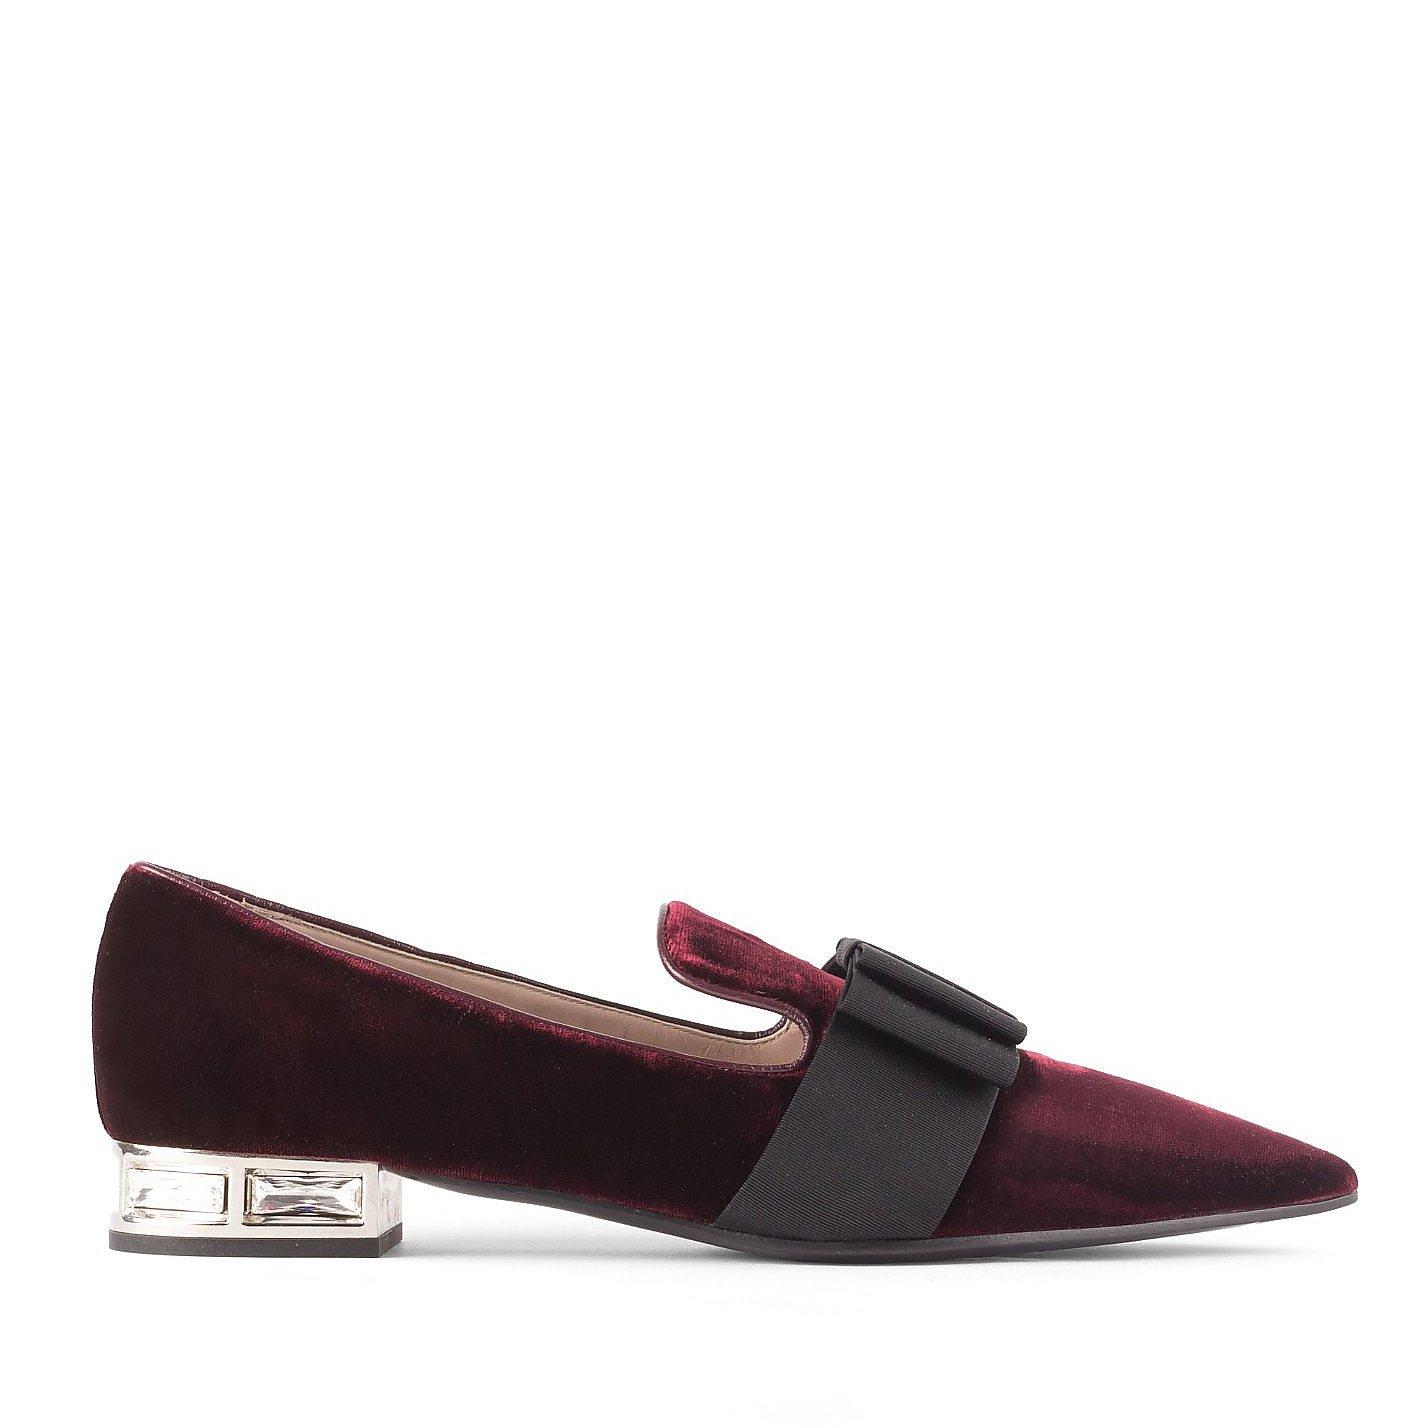 Miu Miu Calzature Donna Shoes